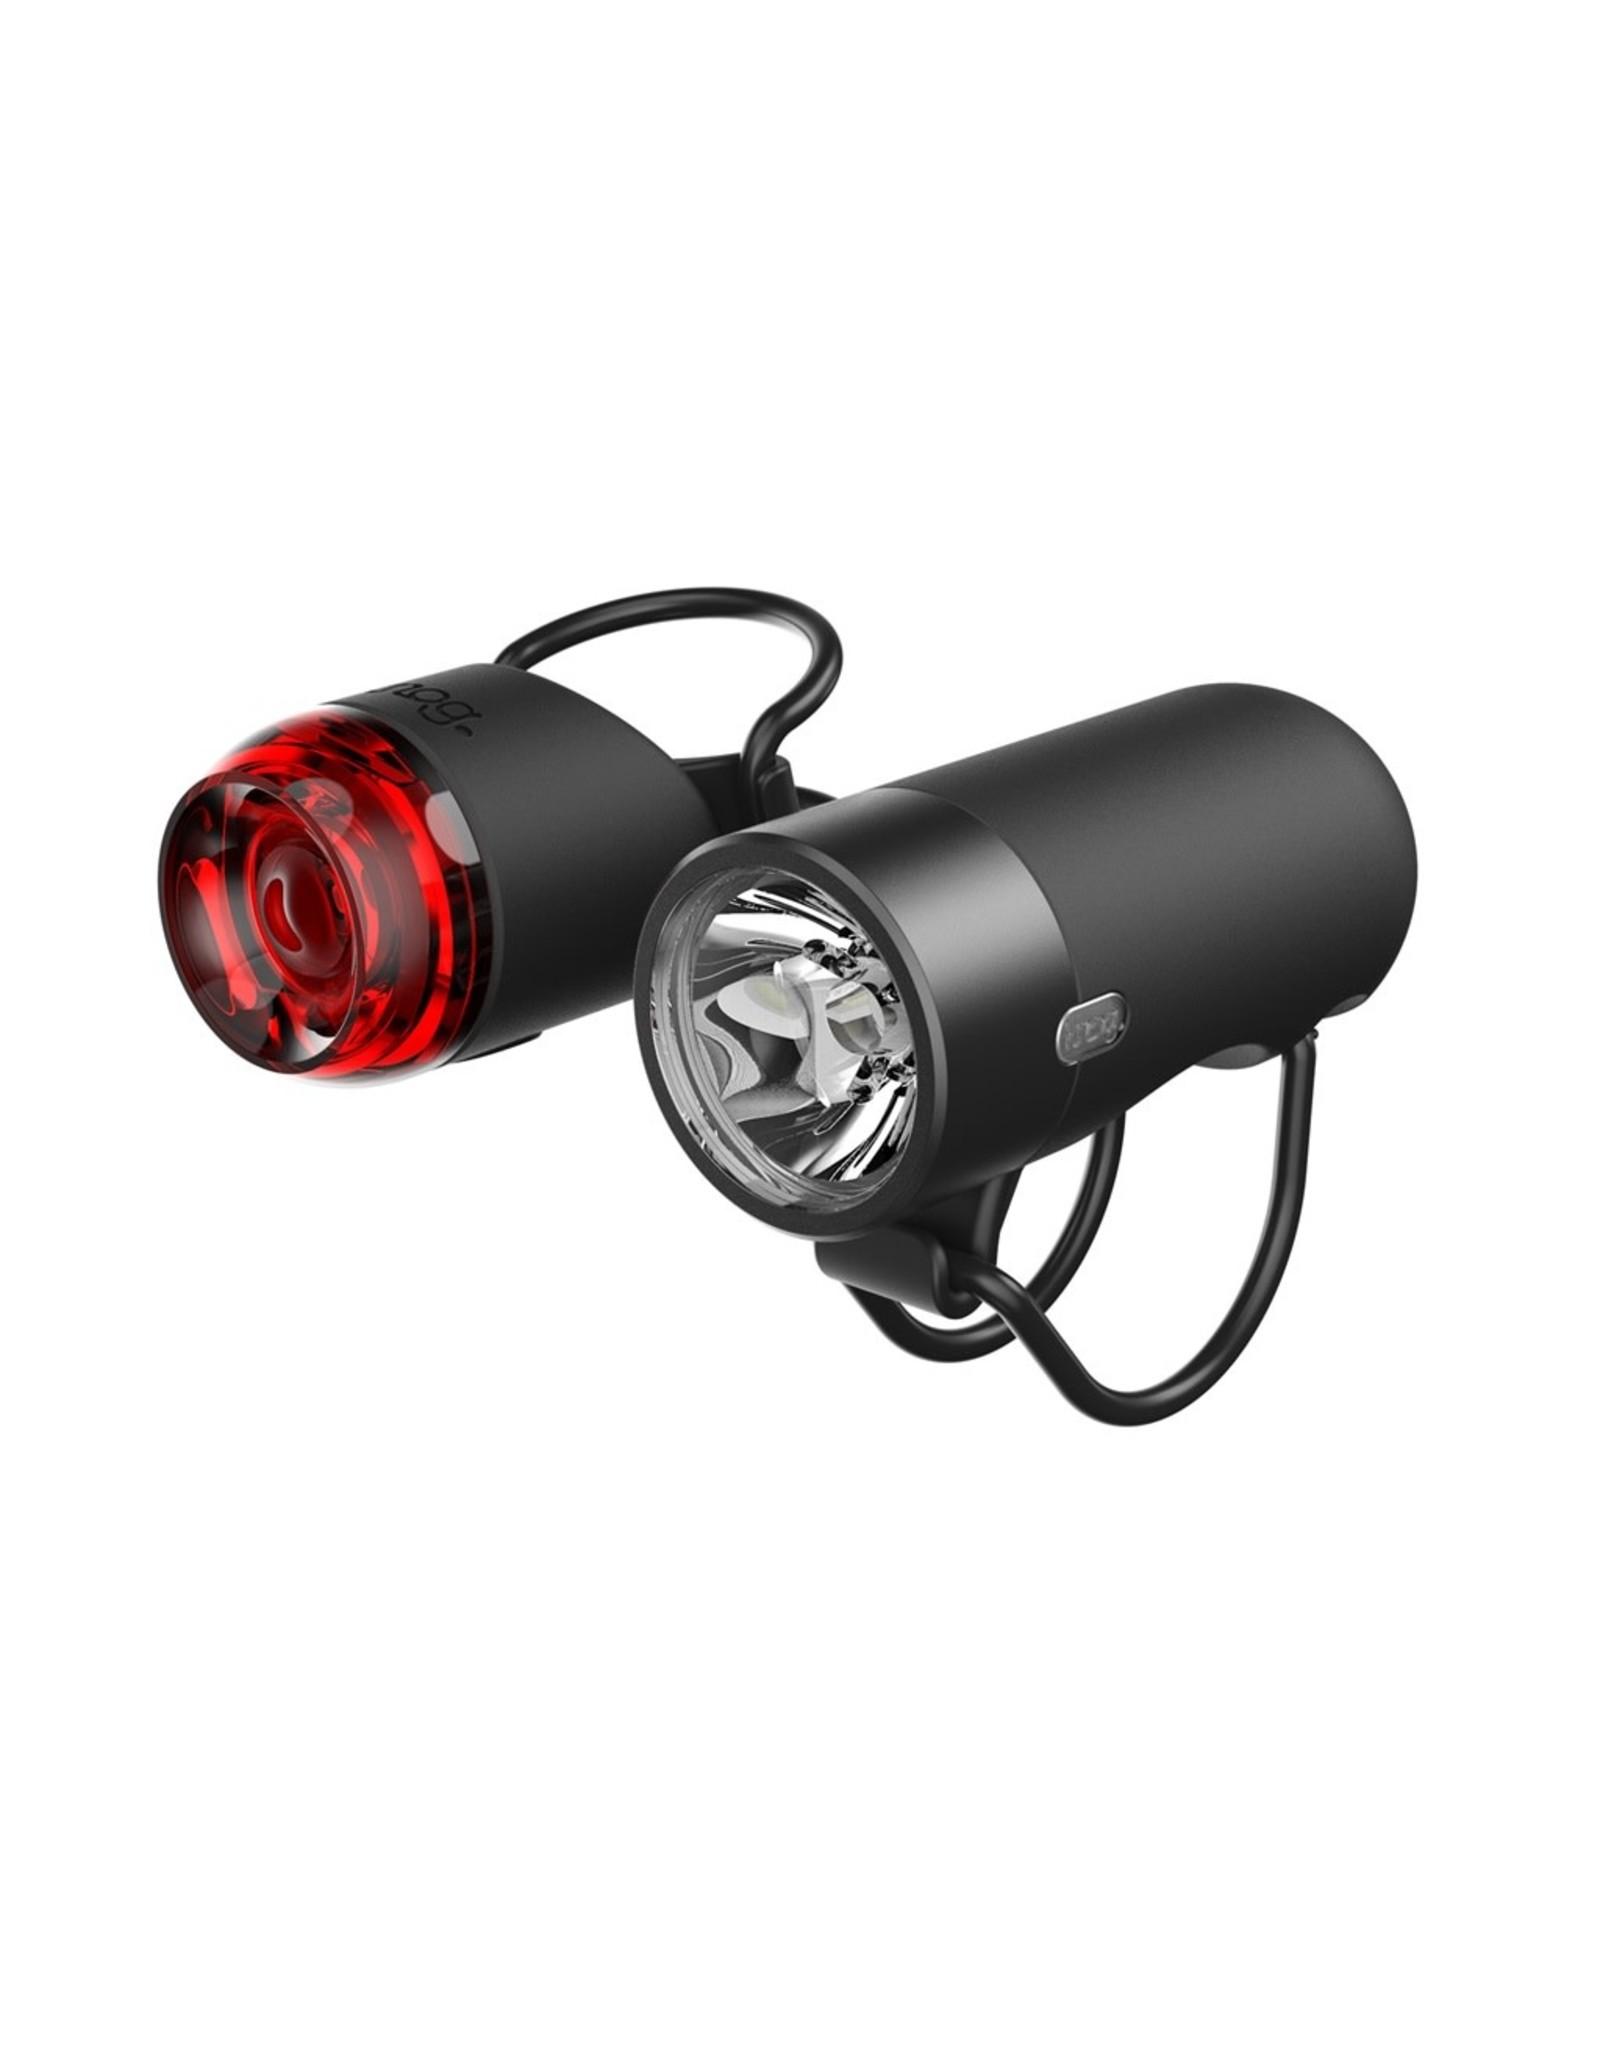 Knog Knog Plug Twinpack Light Set